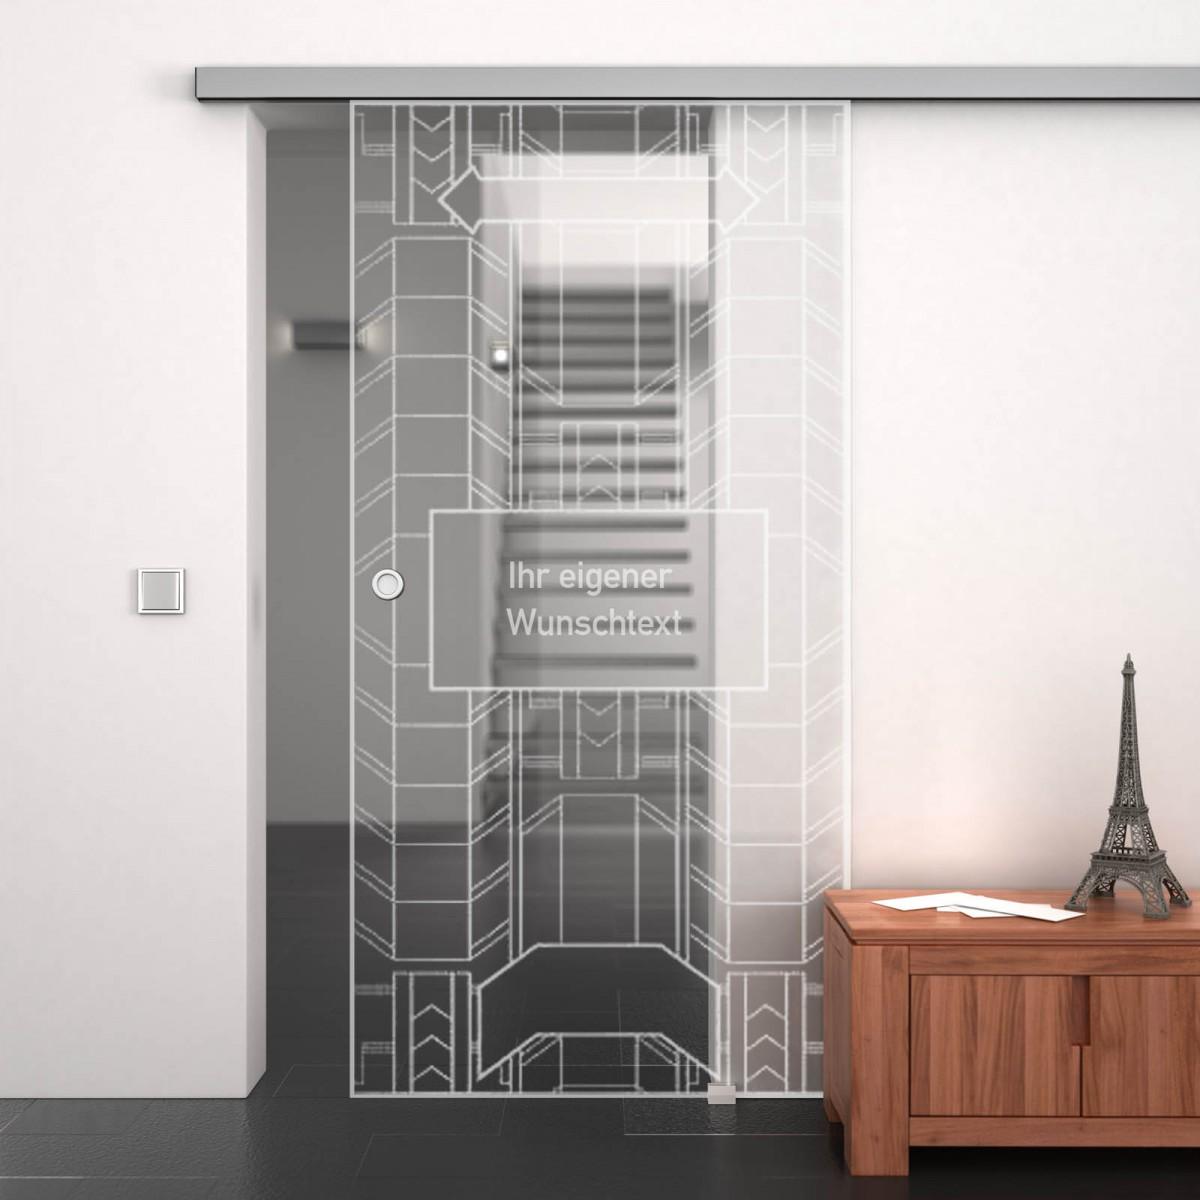 glasschiebet r gelasert mit motiv metropolis 989707988. Black Bedroom Furniture Sets. Home Design Ideas